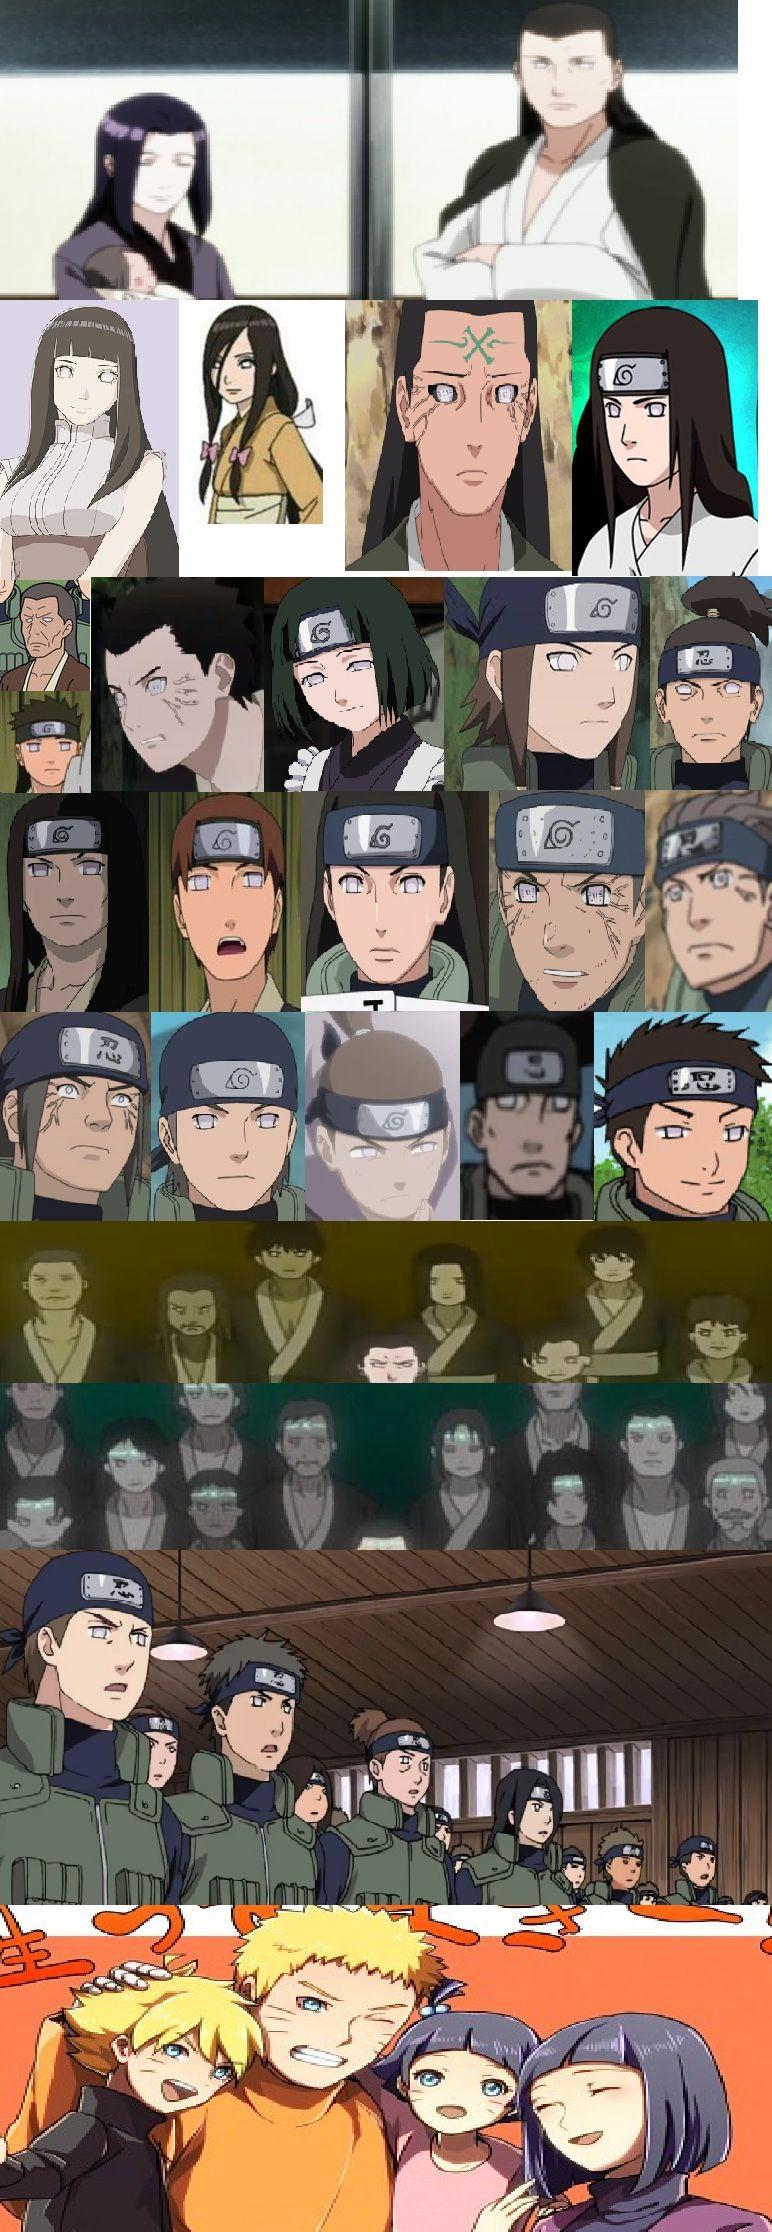 Hyuga Clan 日向一族 The Strogest Clan of Konoha-->Naruto DID say he would change the way of the Huga clan